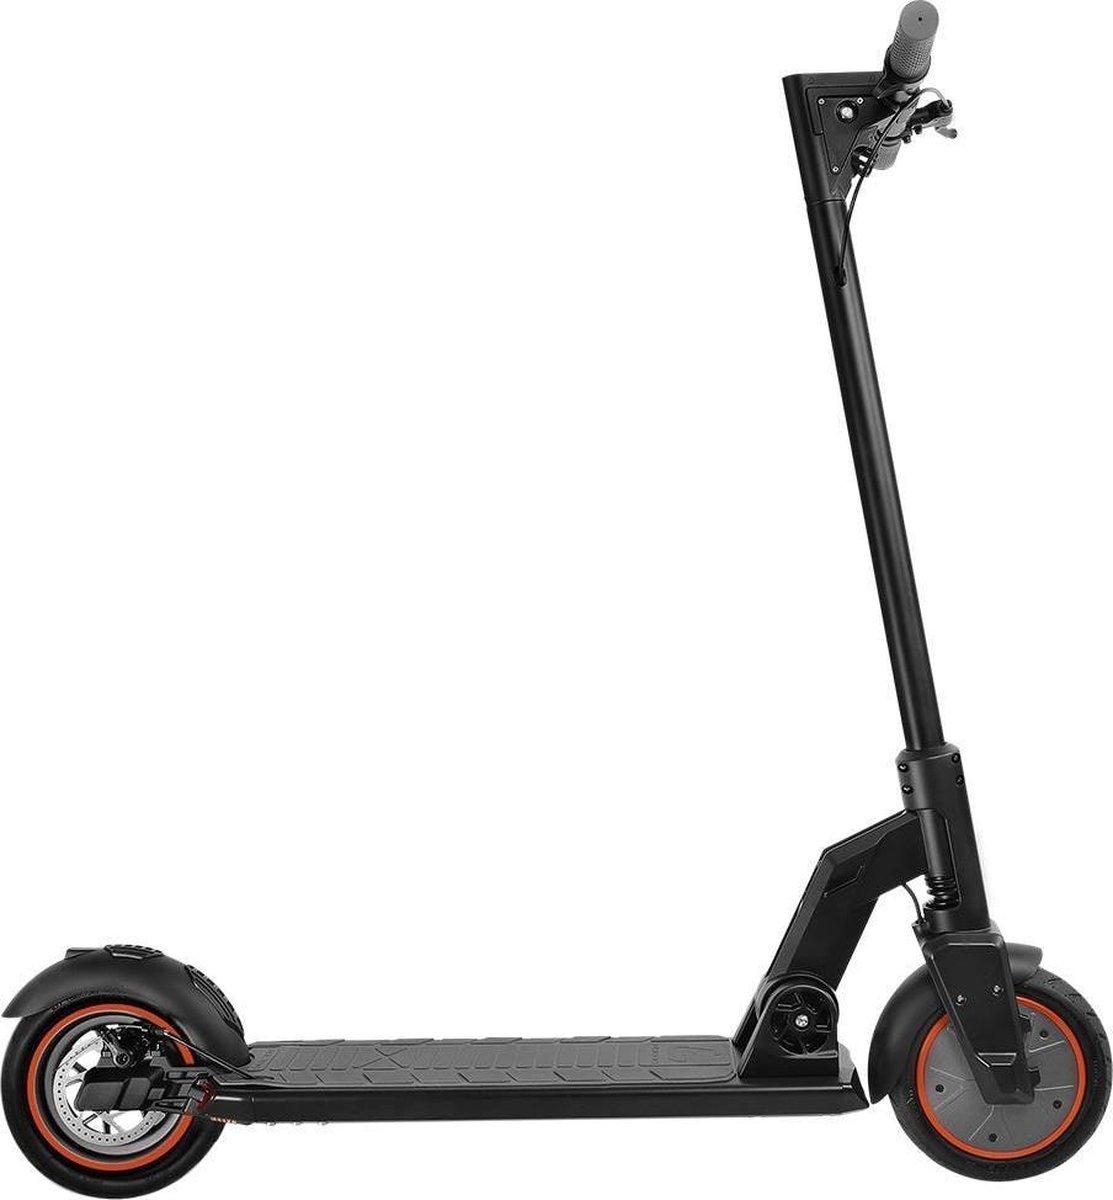 KUGOO M2 PRO Zwart Electrische Scooter / Step